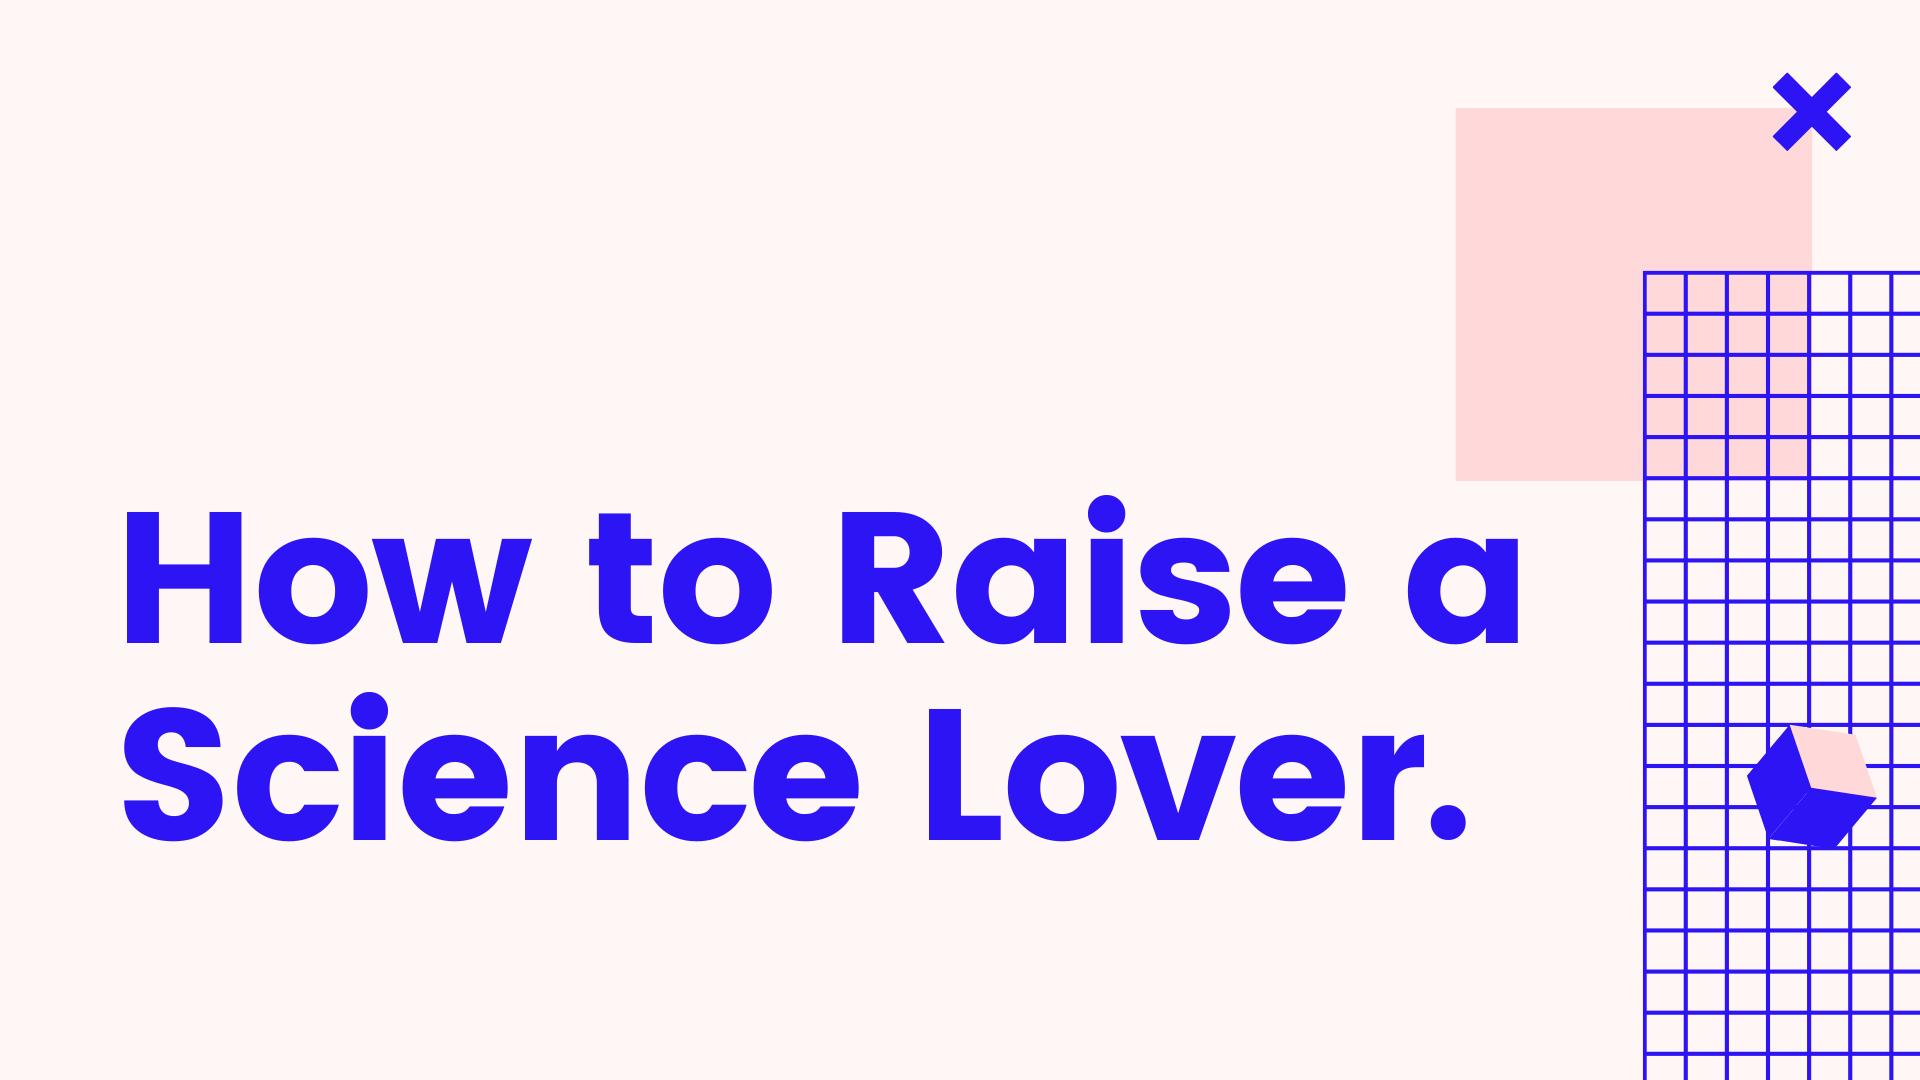 Science Lover